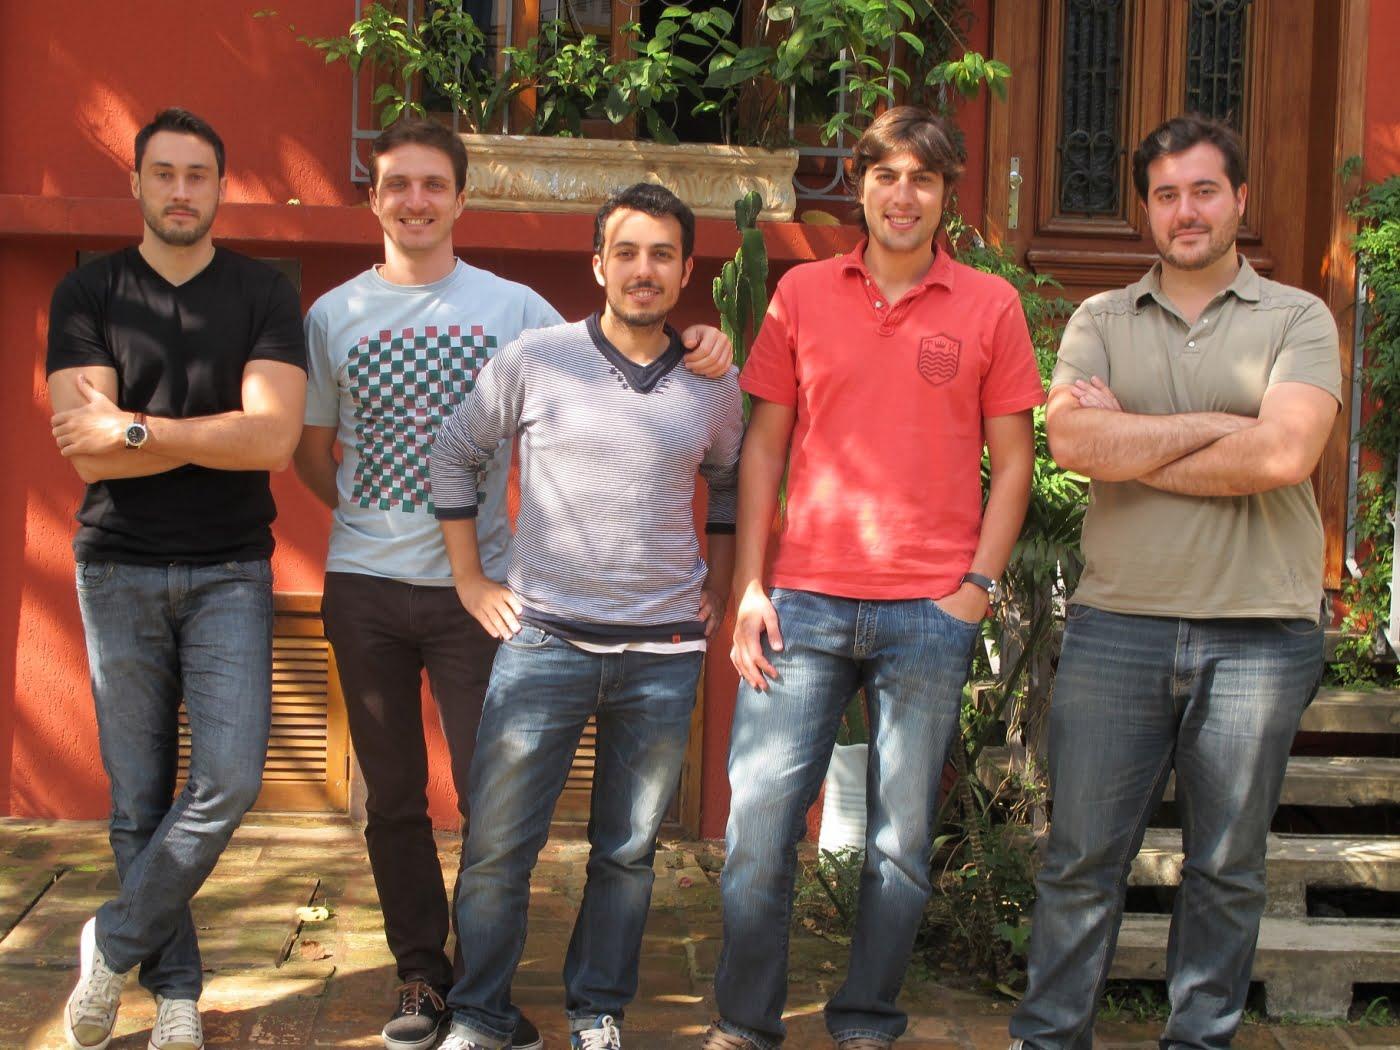 Los cinco amigos da Descola: Gustavo Paiva, Caio Casseb, Atair Trindade, André Tanesi e Daniel Pasqualucci